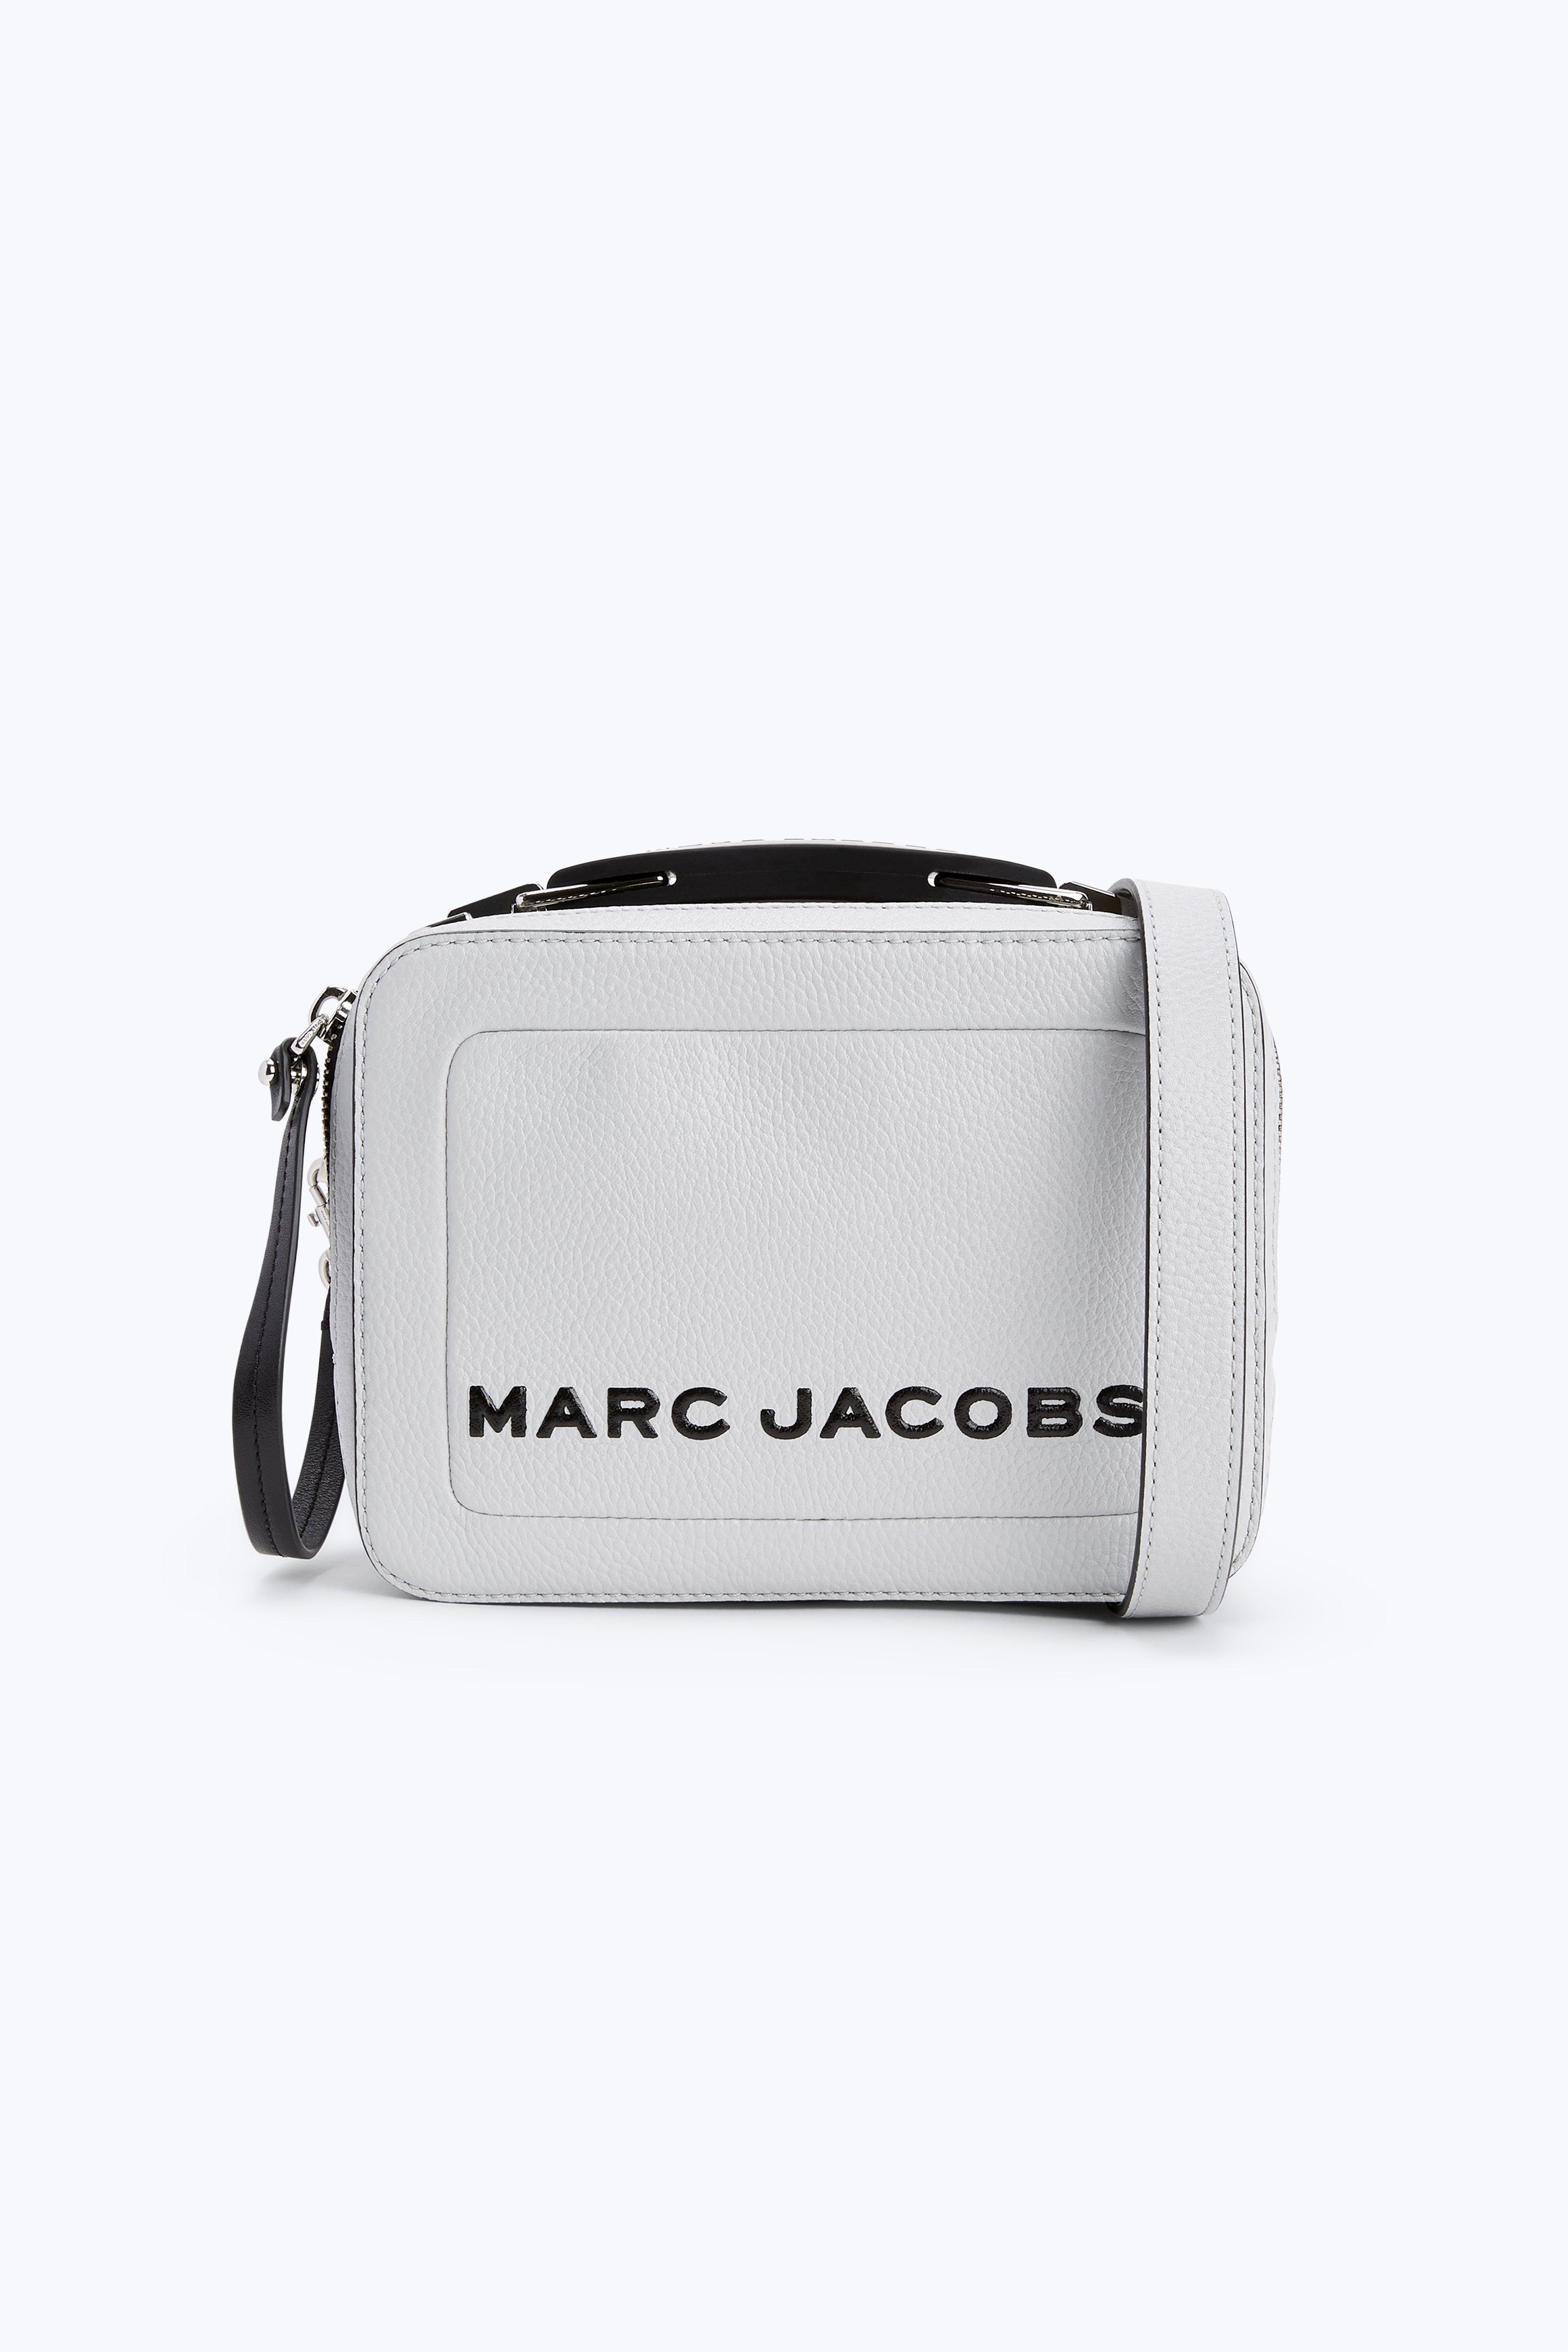 marc jacobs väska silver